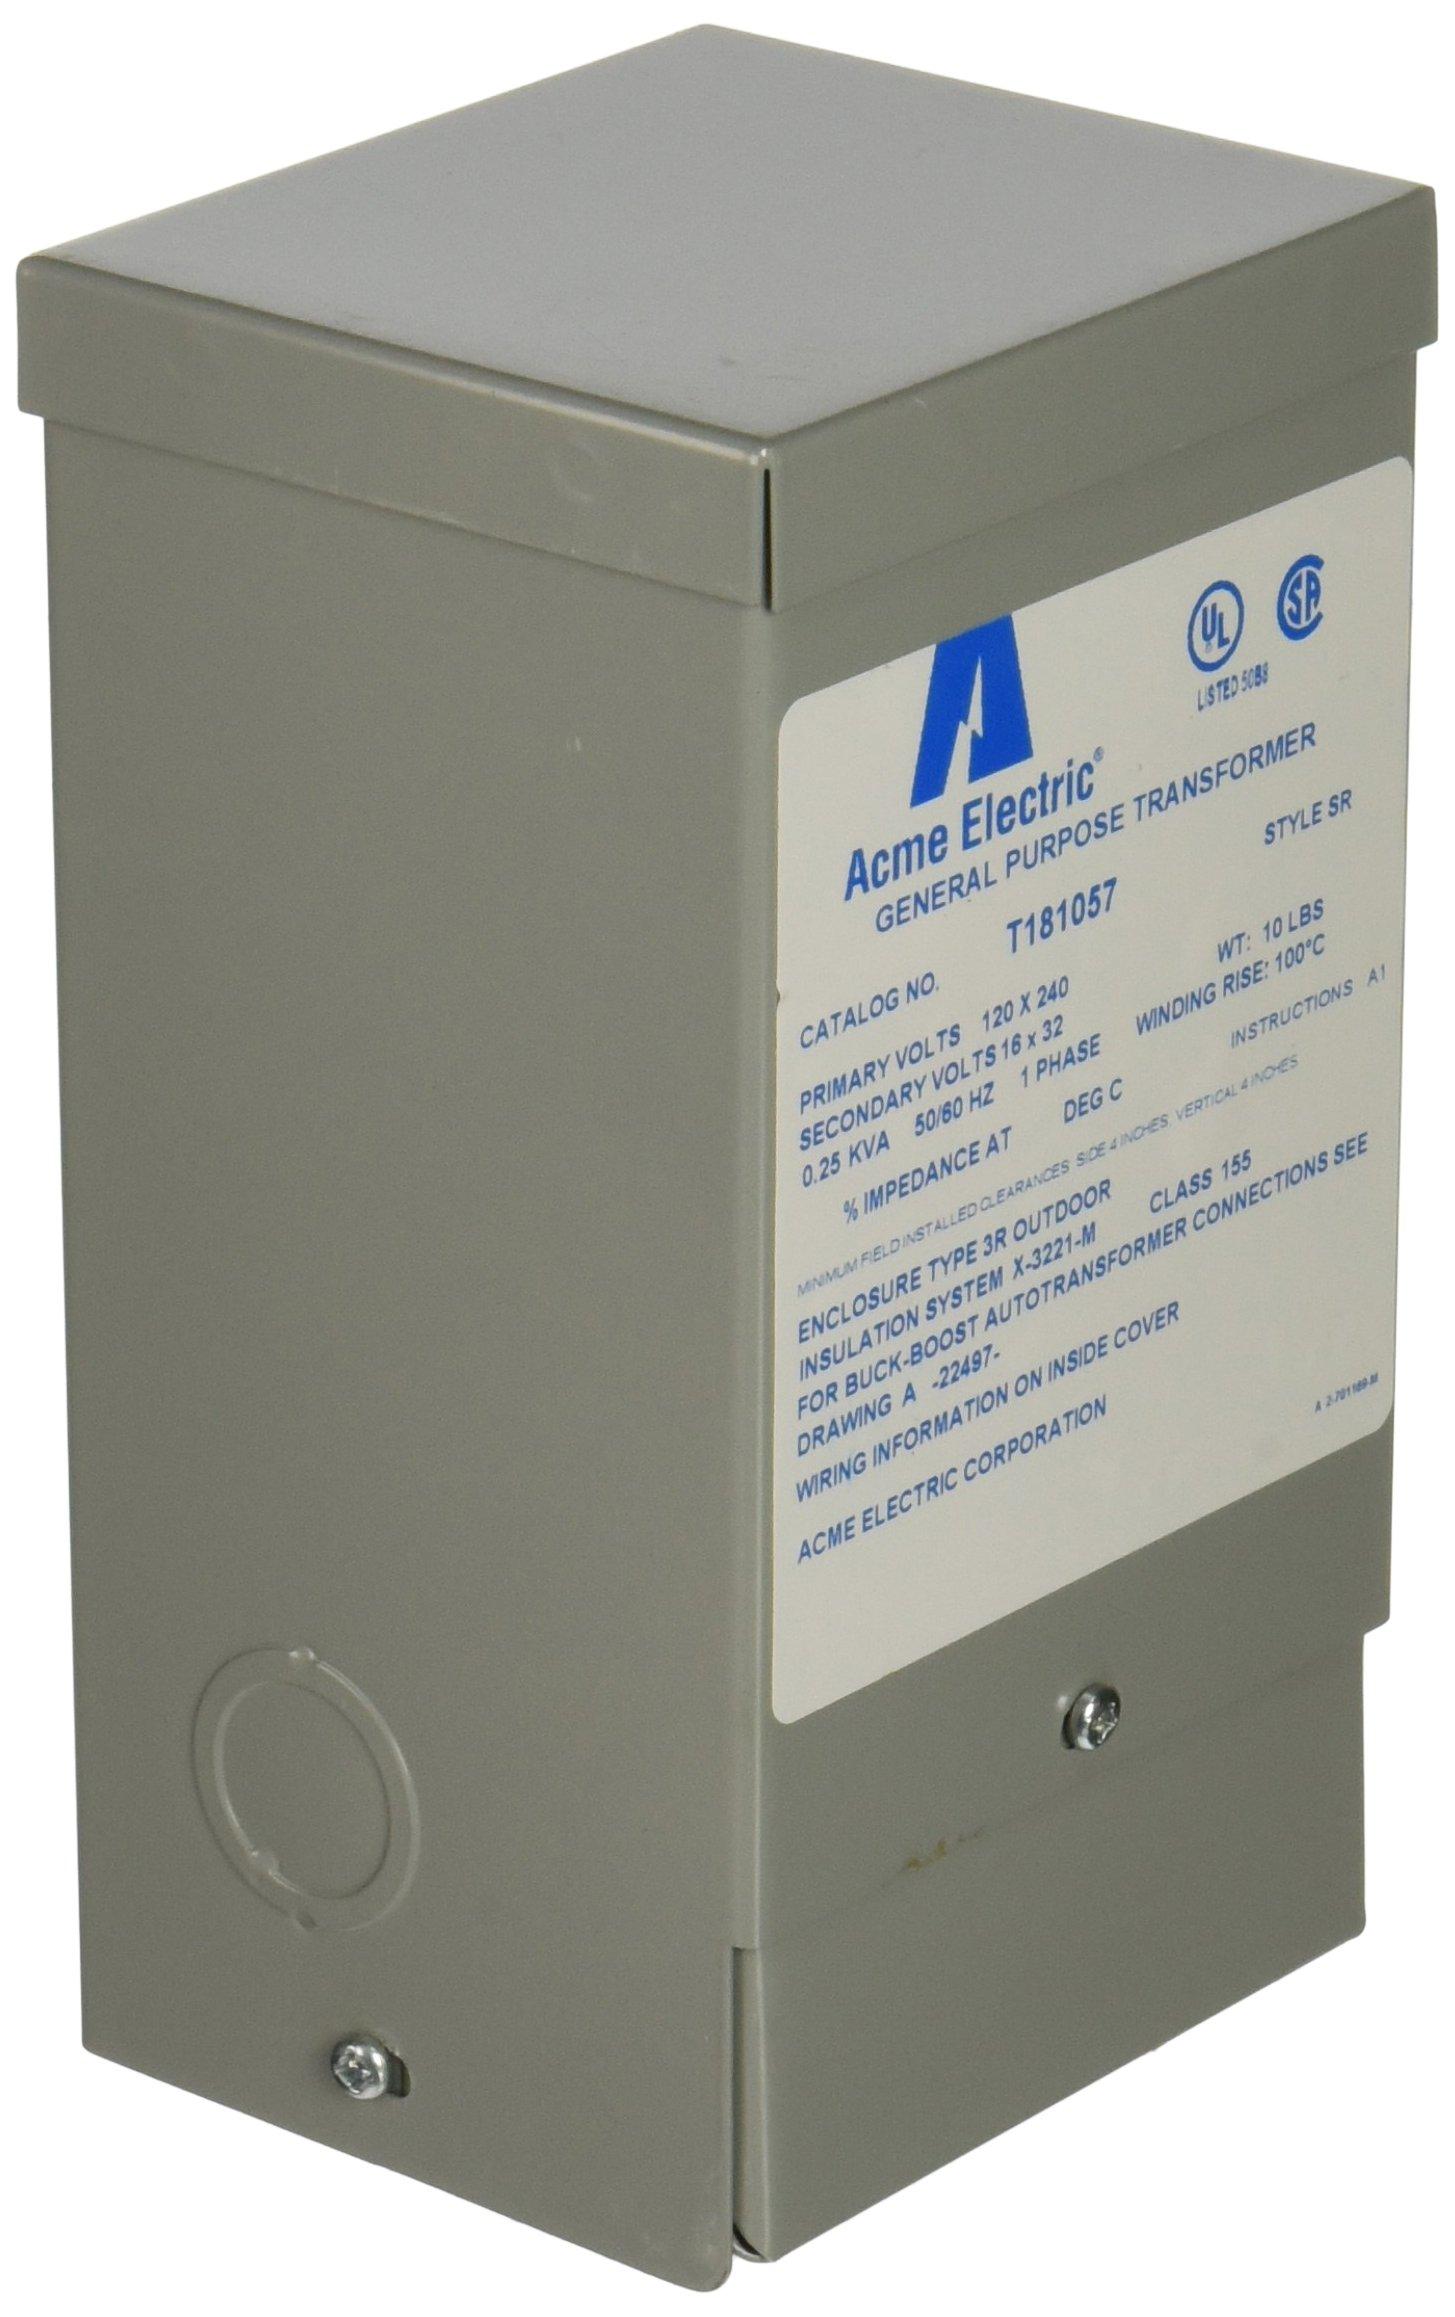 Hubbell Acme Electric T181057 Buck-Boost Transformer, 1 Phase, 60 Hz, 0.25 kVA, 120V x 240V Primary Volts, 16V/32V Secondary Volts